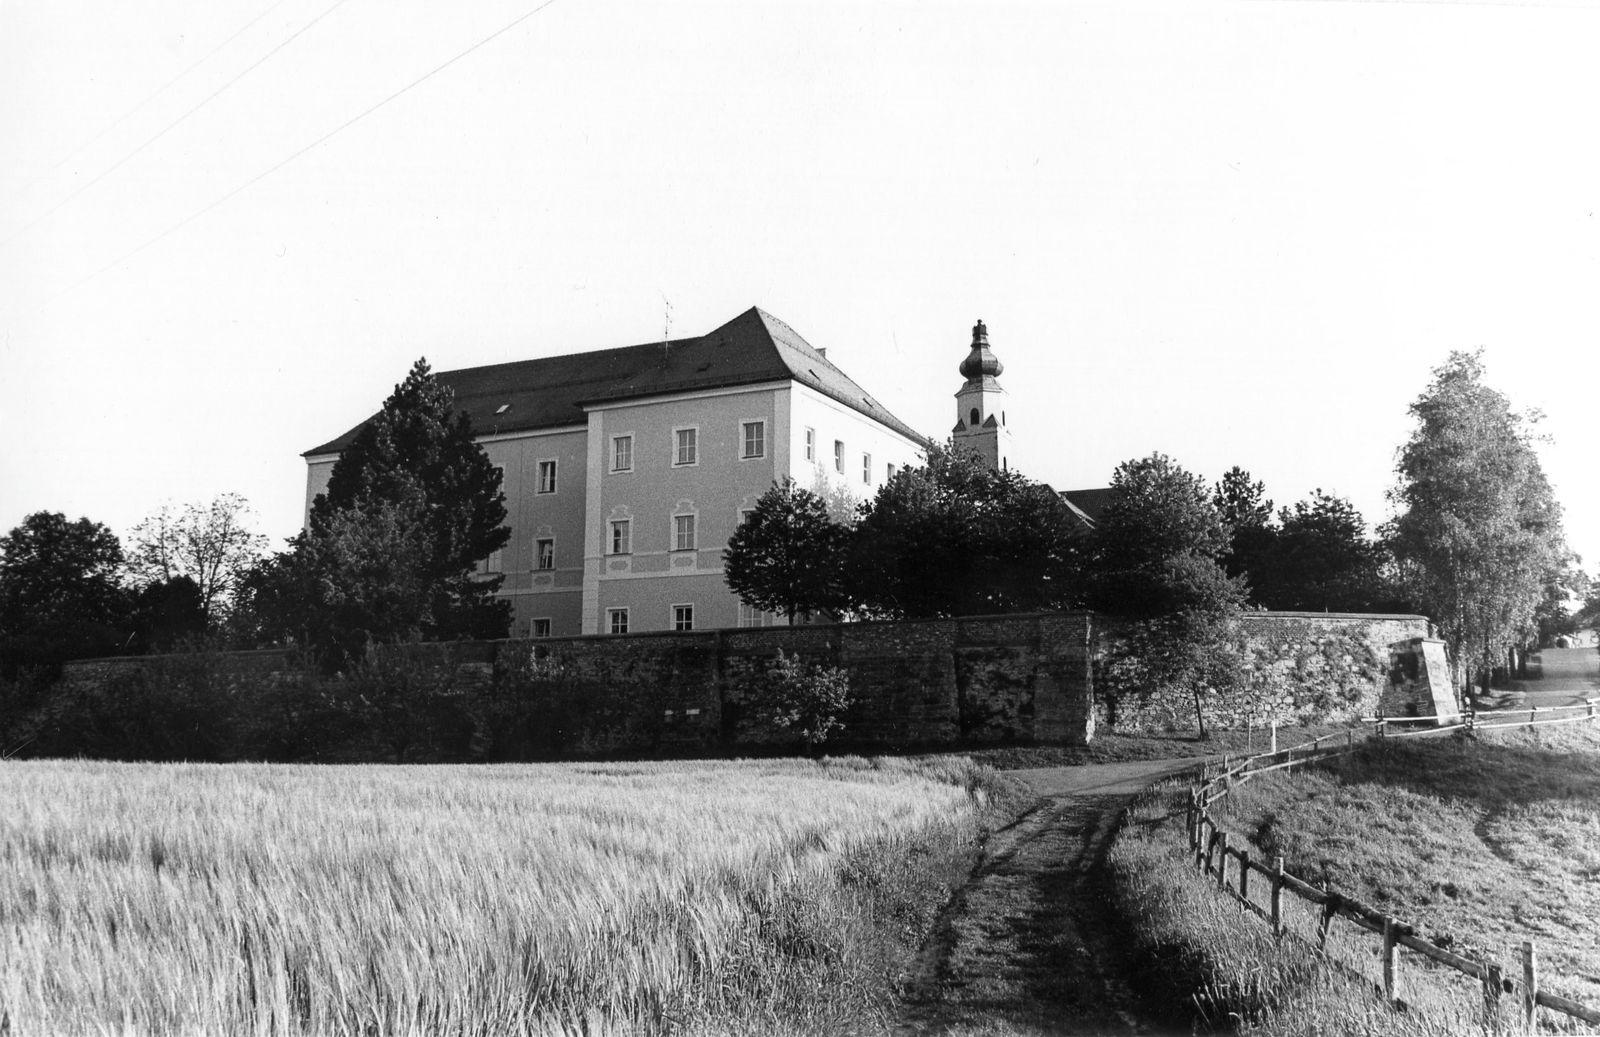 Kloster Windberg in Niederbayern